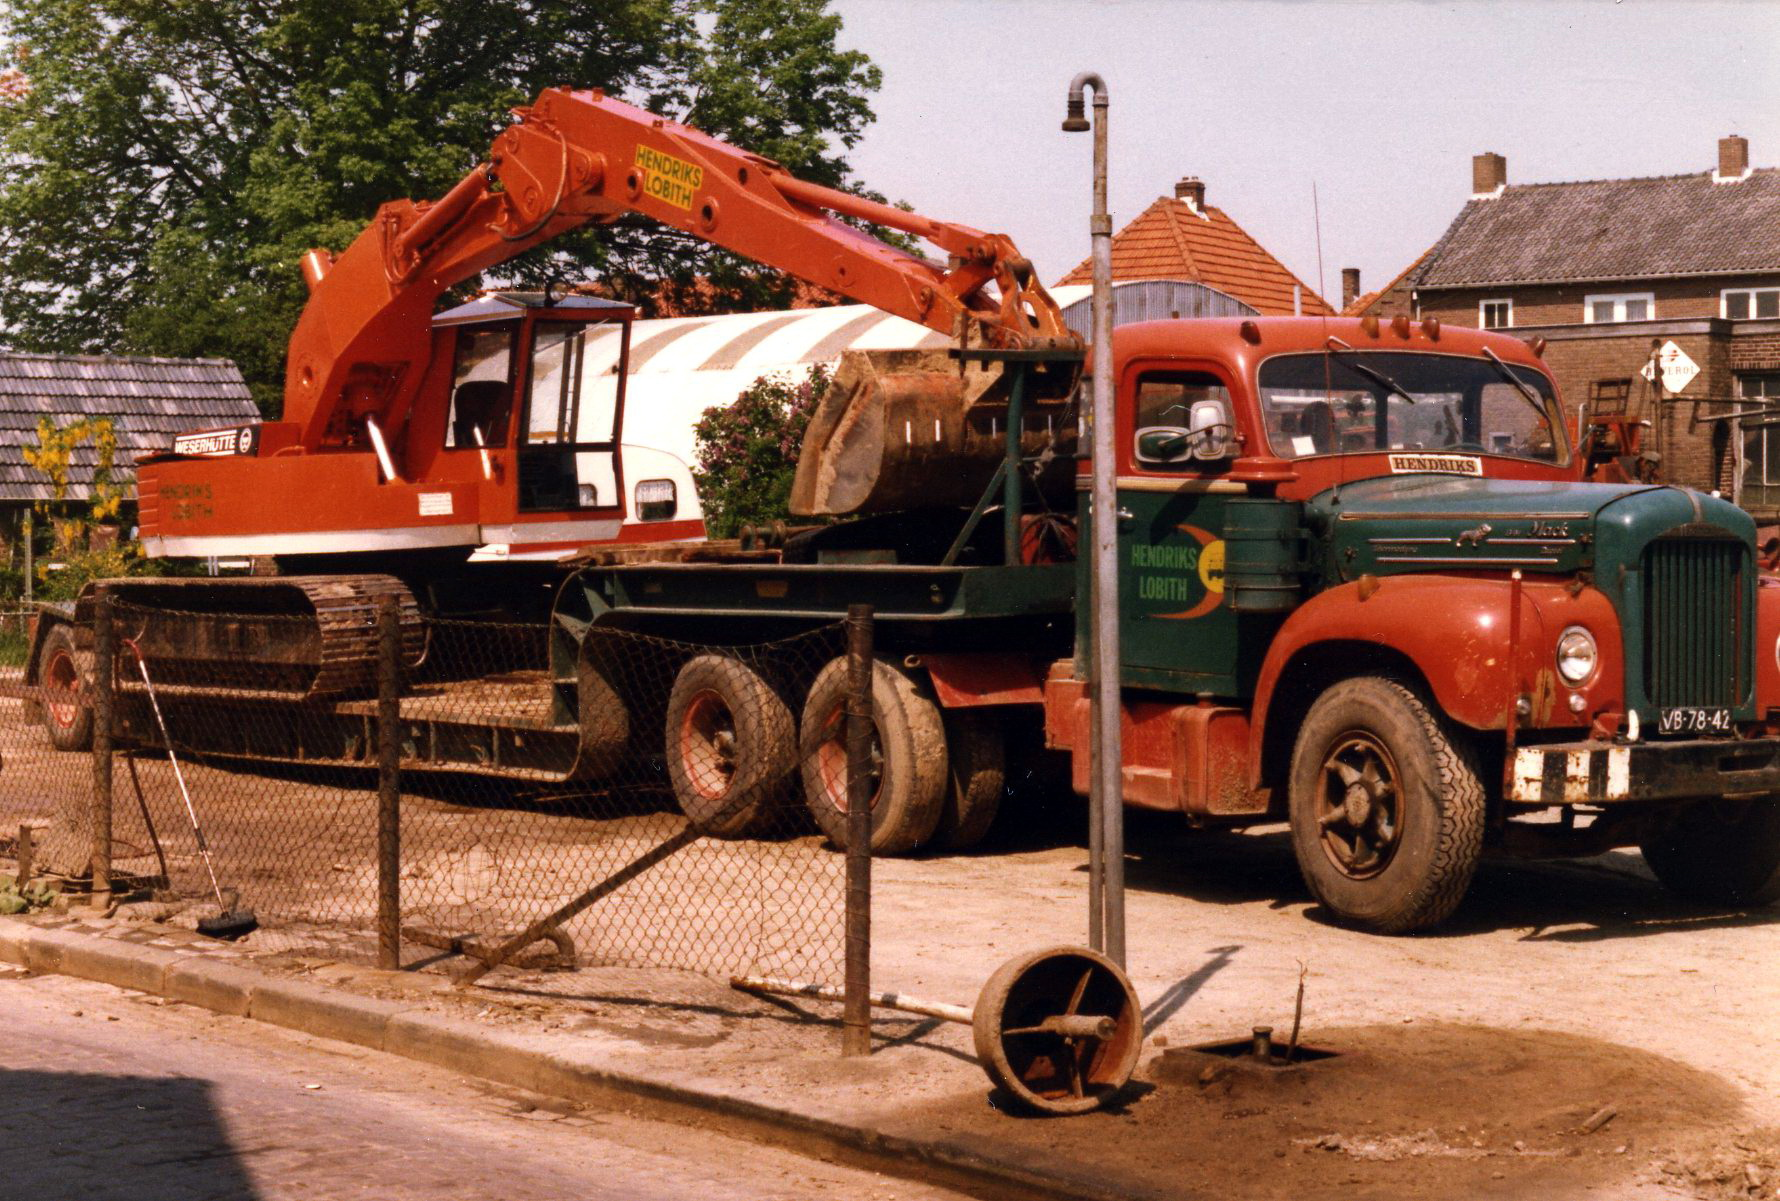 Hendriks-Lobith-Mack-B61S-VB7842-3